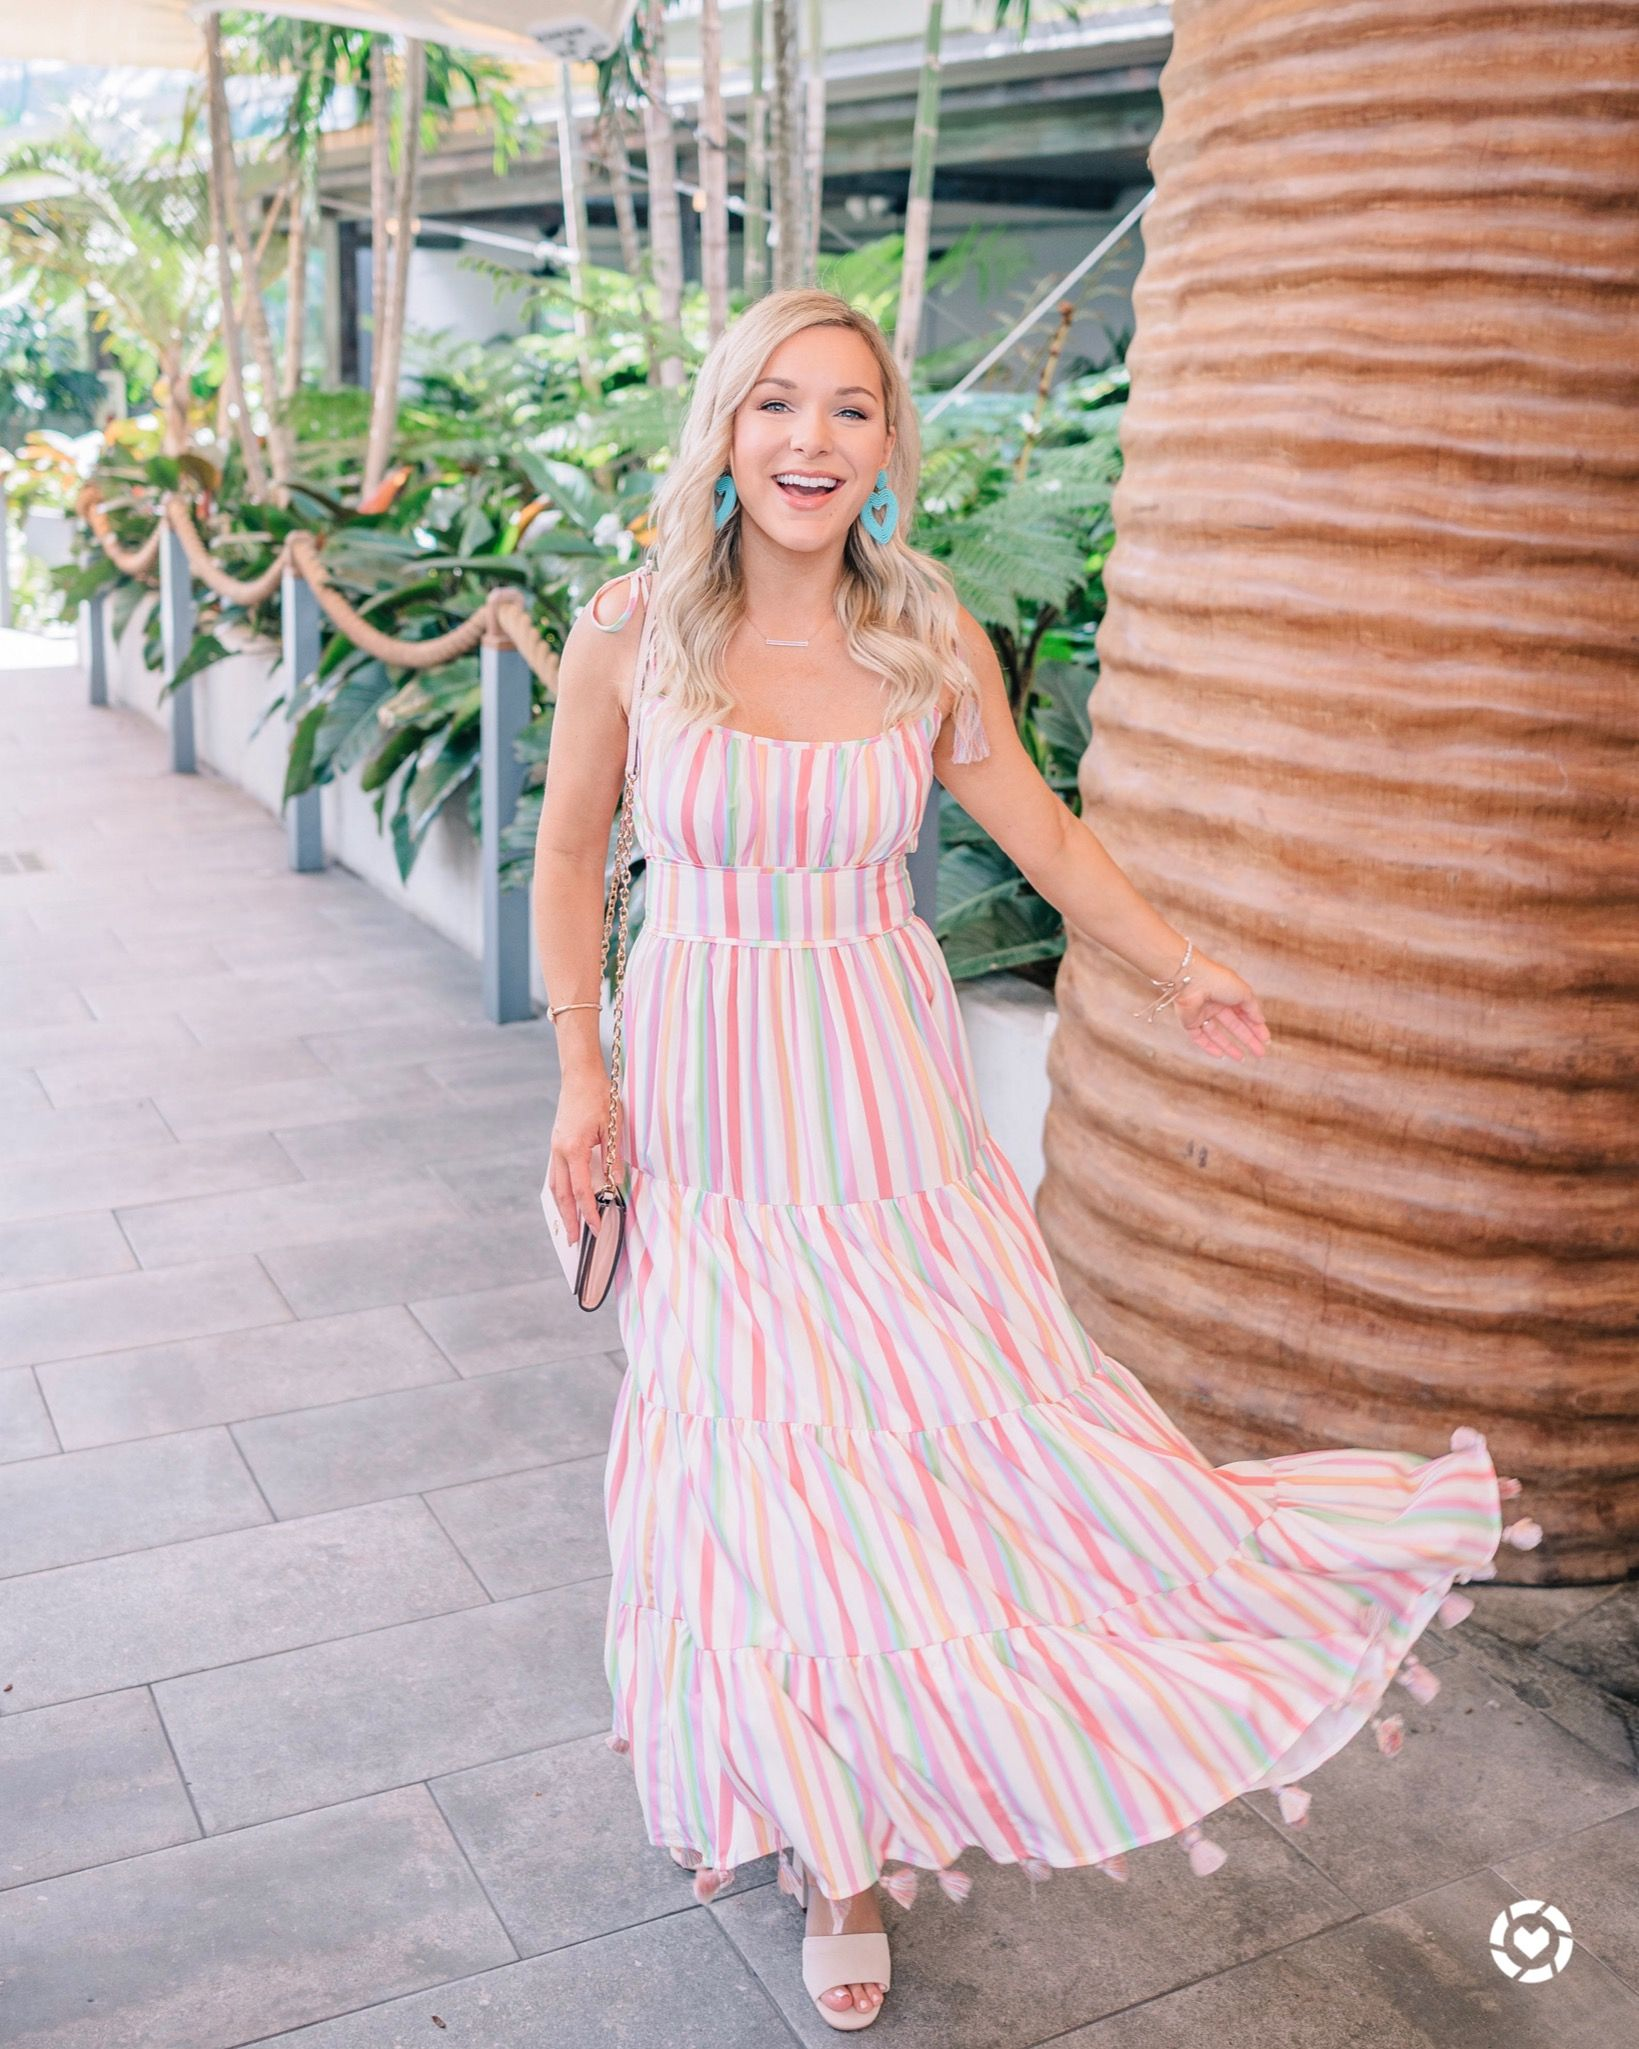 Pastel Striped Maxi Dress With Tassels Summer Style Striped Maxi Dresses Maxi Dress Dresses [ 2049 x 1639 Pixel ]